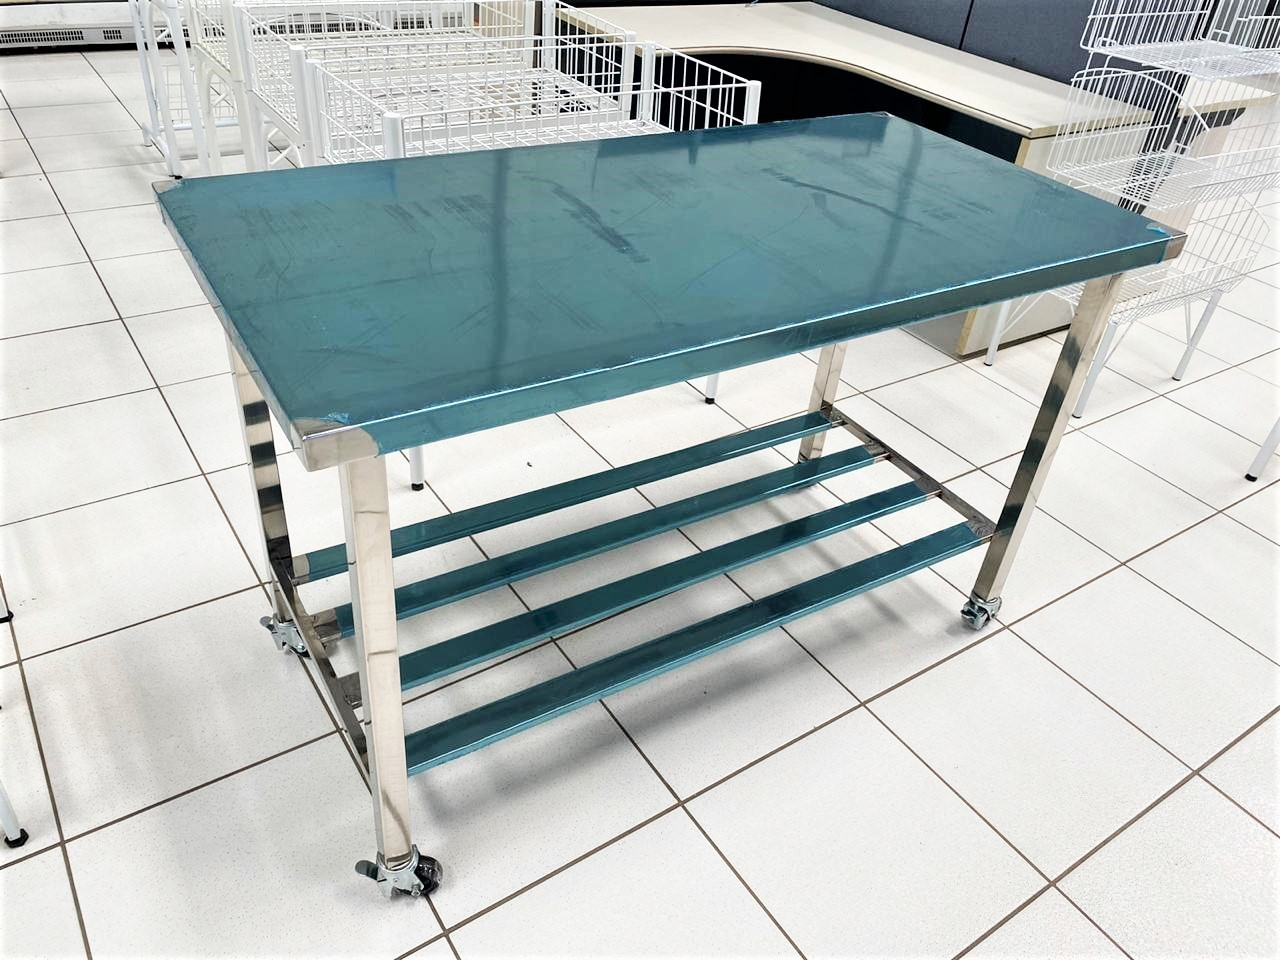 Mesa Industrial Reforçada Aço Inox 124 X 70 X 77 Cm C/ Rodizio - Sob Medida